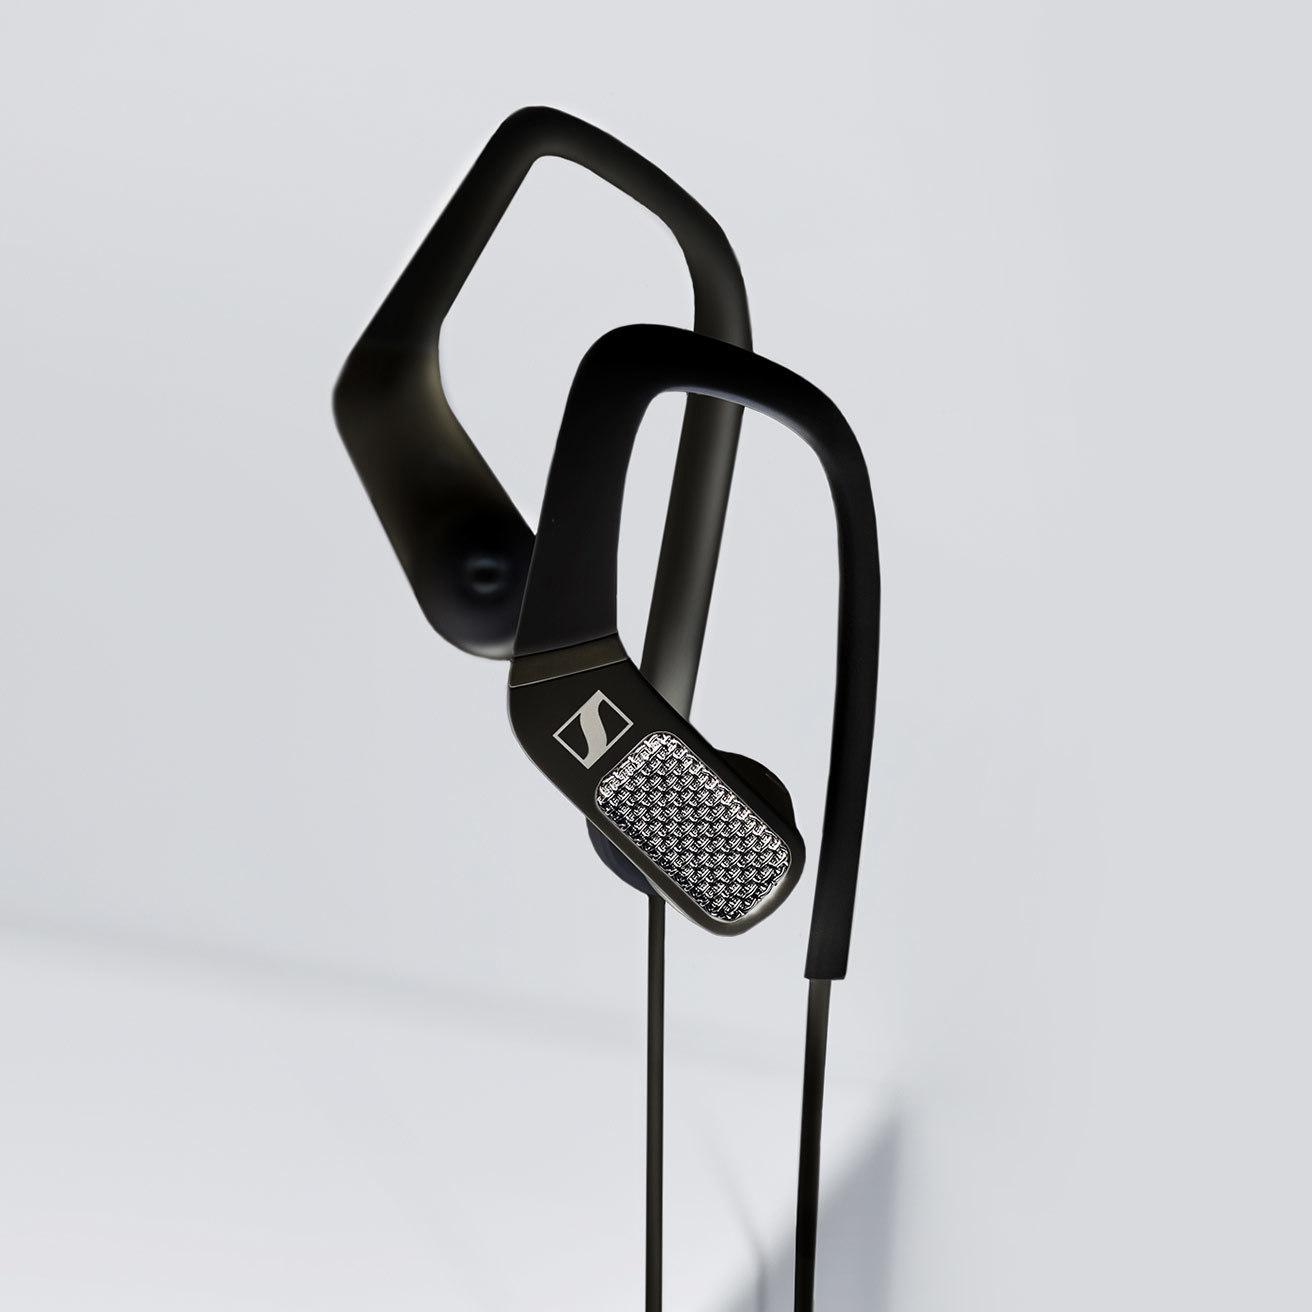 93294fb3a38 Sennheiser AMBEO Smart Headset - Mobile binaural recording headset